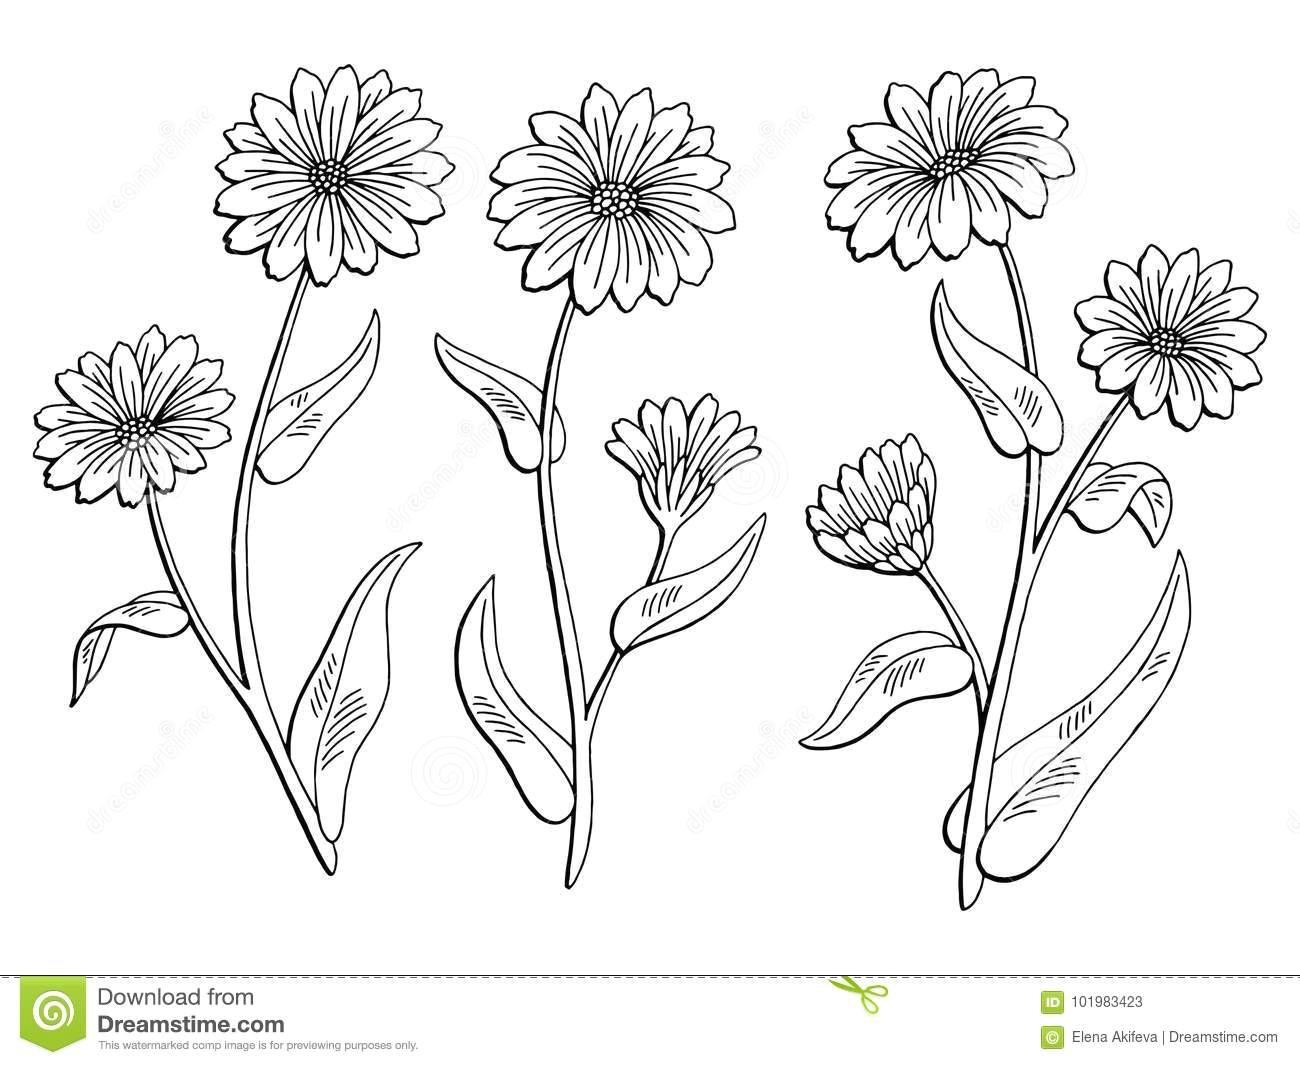 Drawings Of Calendula Flowers Calendula Flower Graphic Black White isolated Sketch Illustration